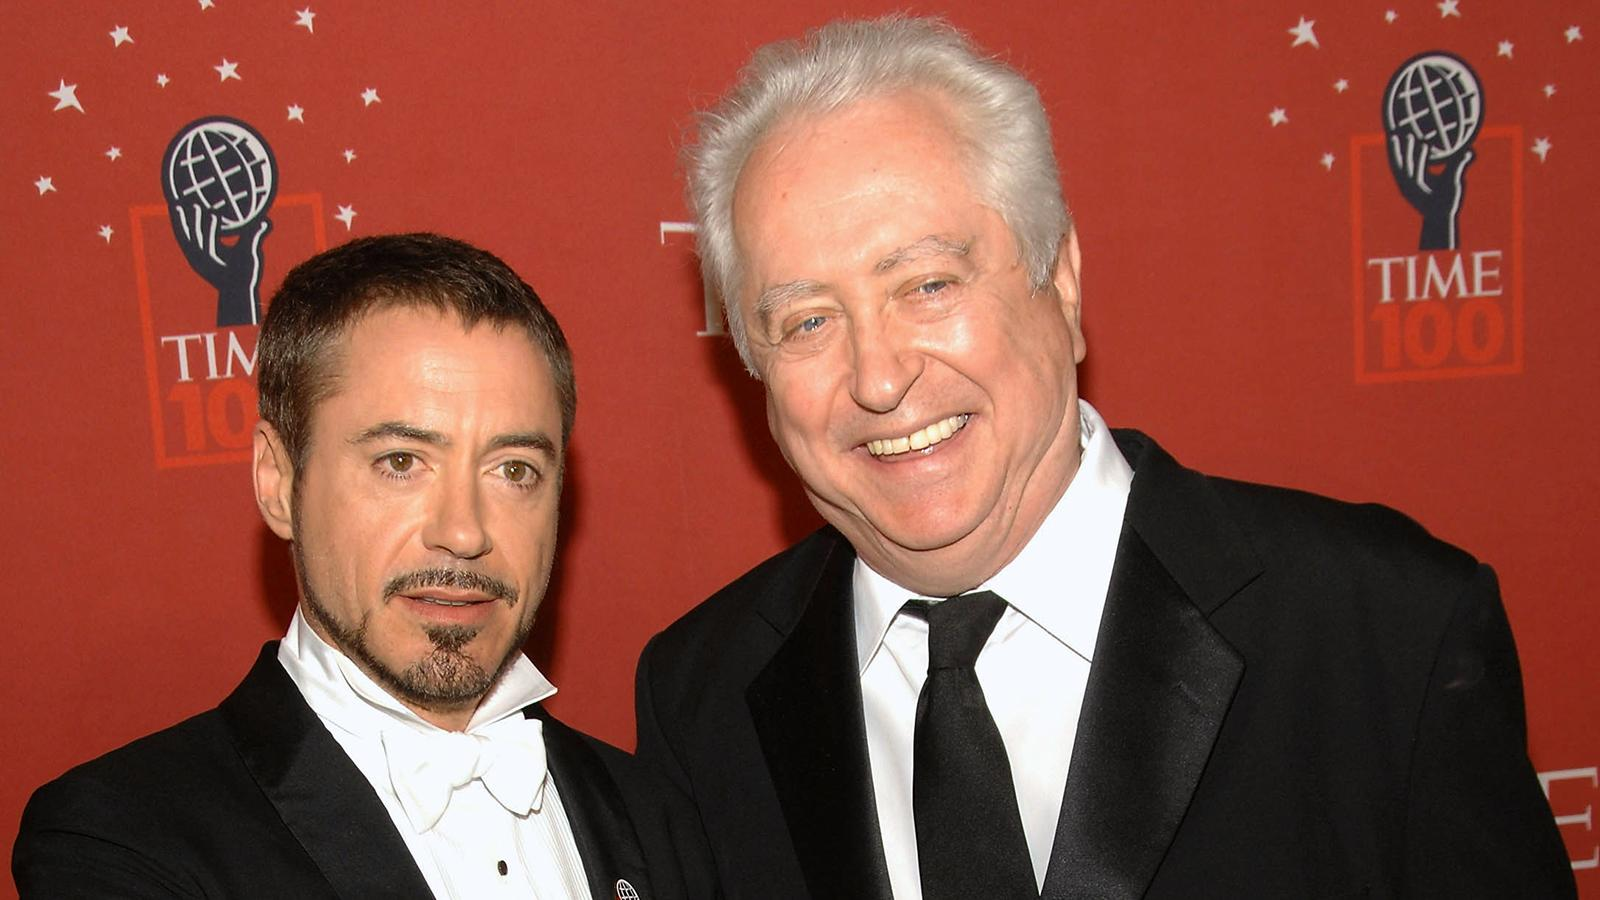 Robert Downey Jr och Robert Downey Sr 2008.